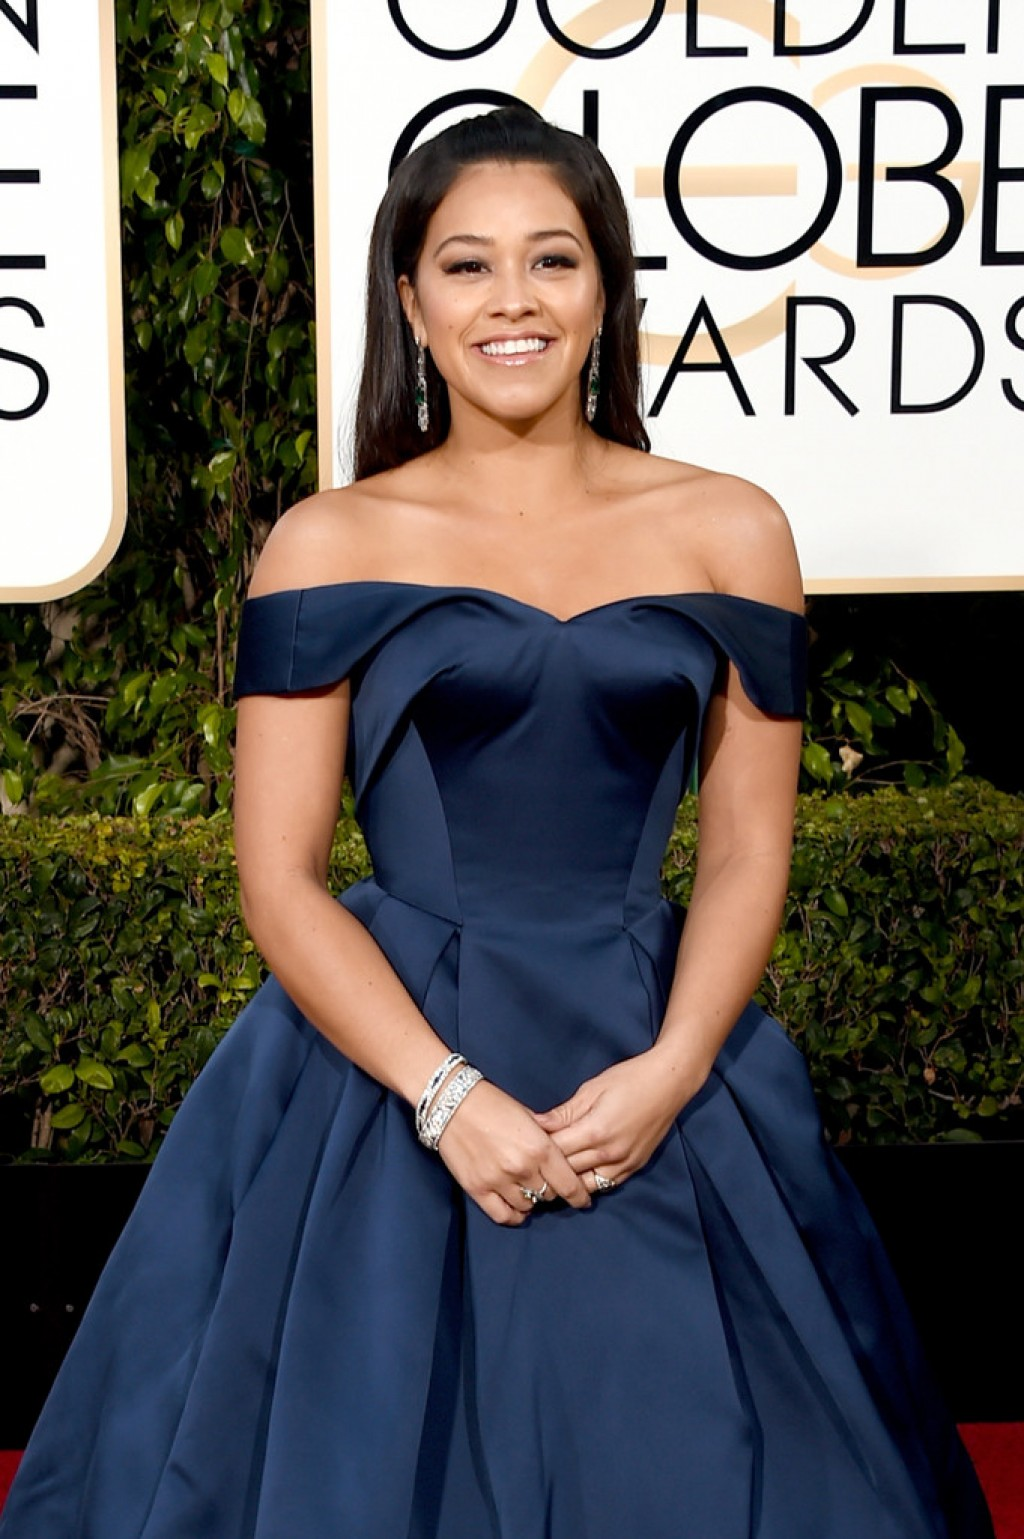 Gina-Rodriguez-Zac-Posen-2016-Golden-Globe-Awards-1024x1539-1